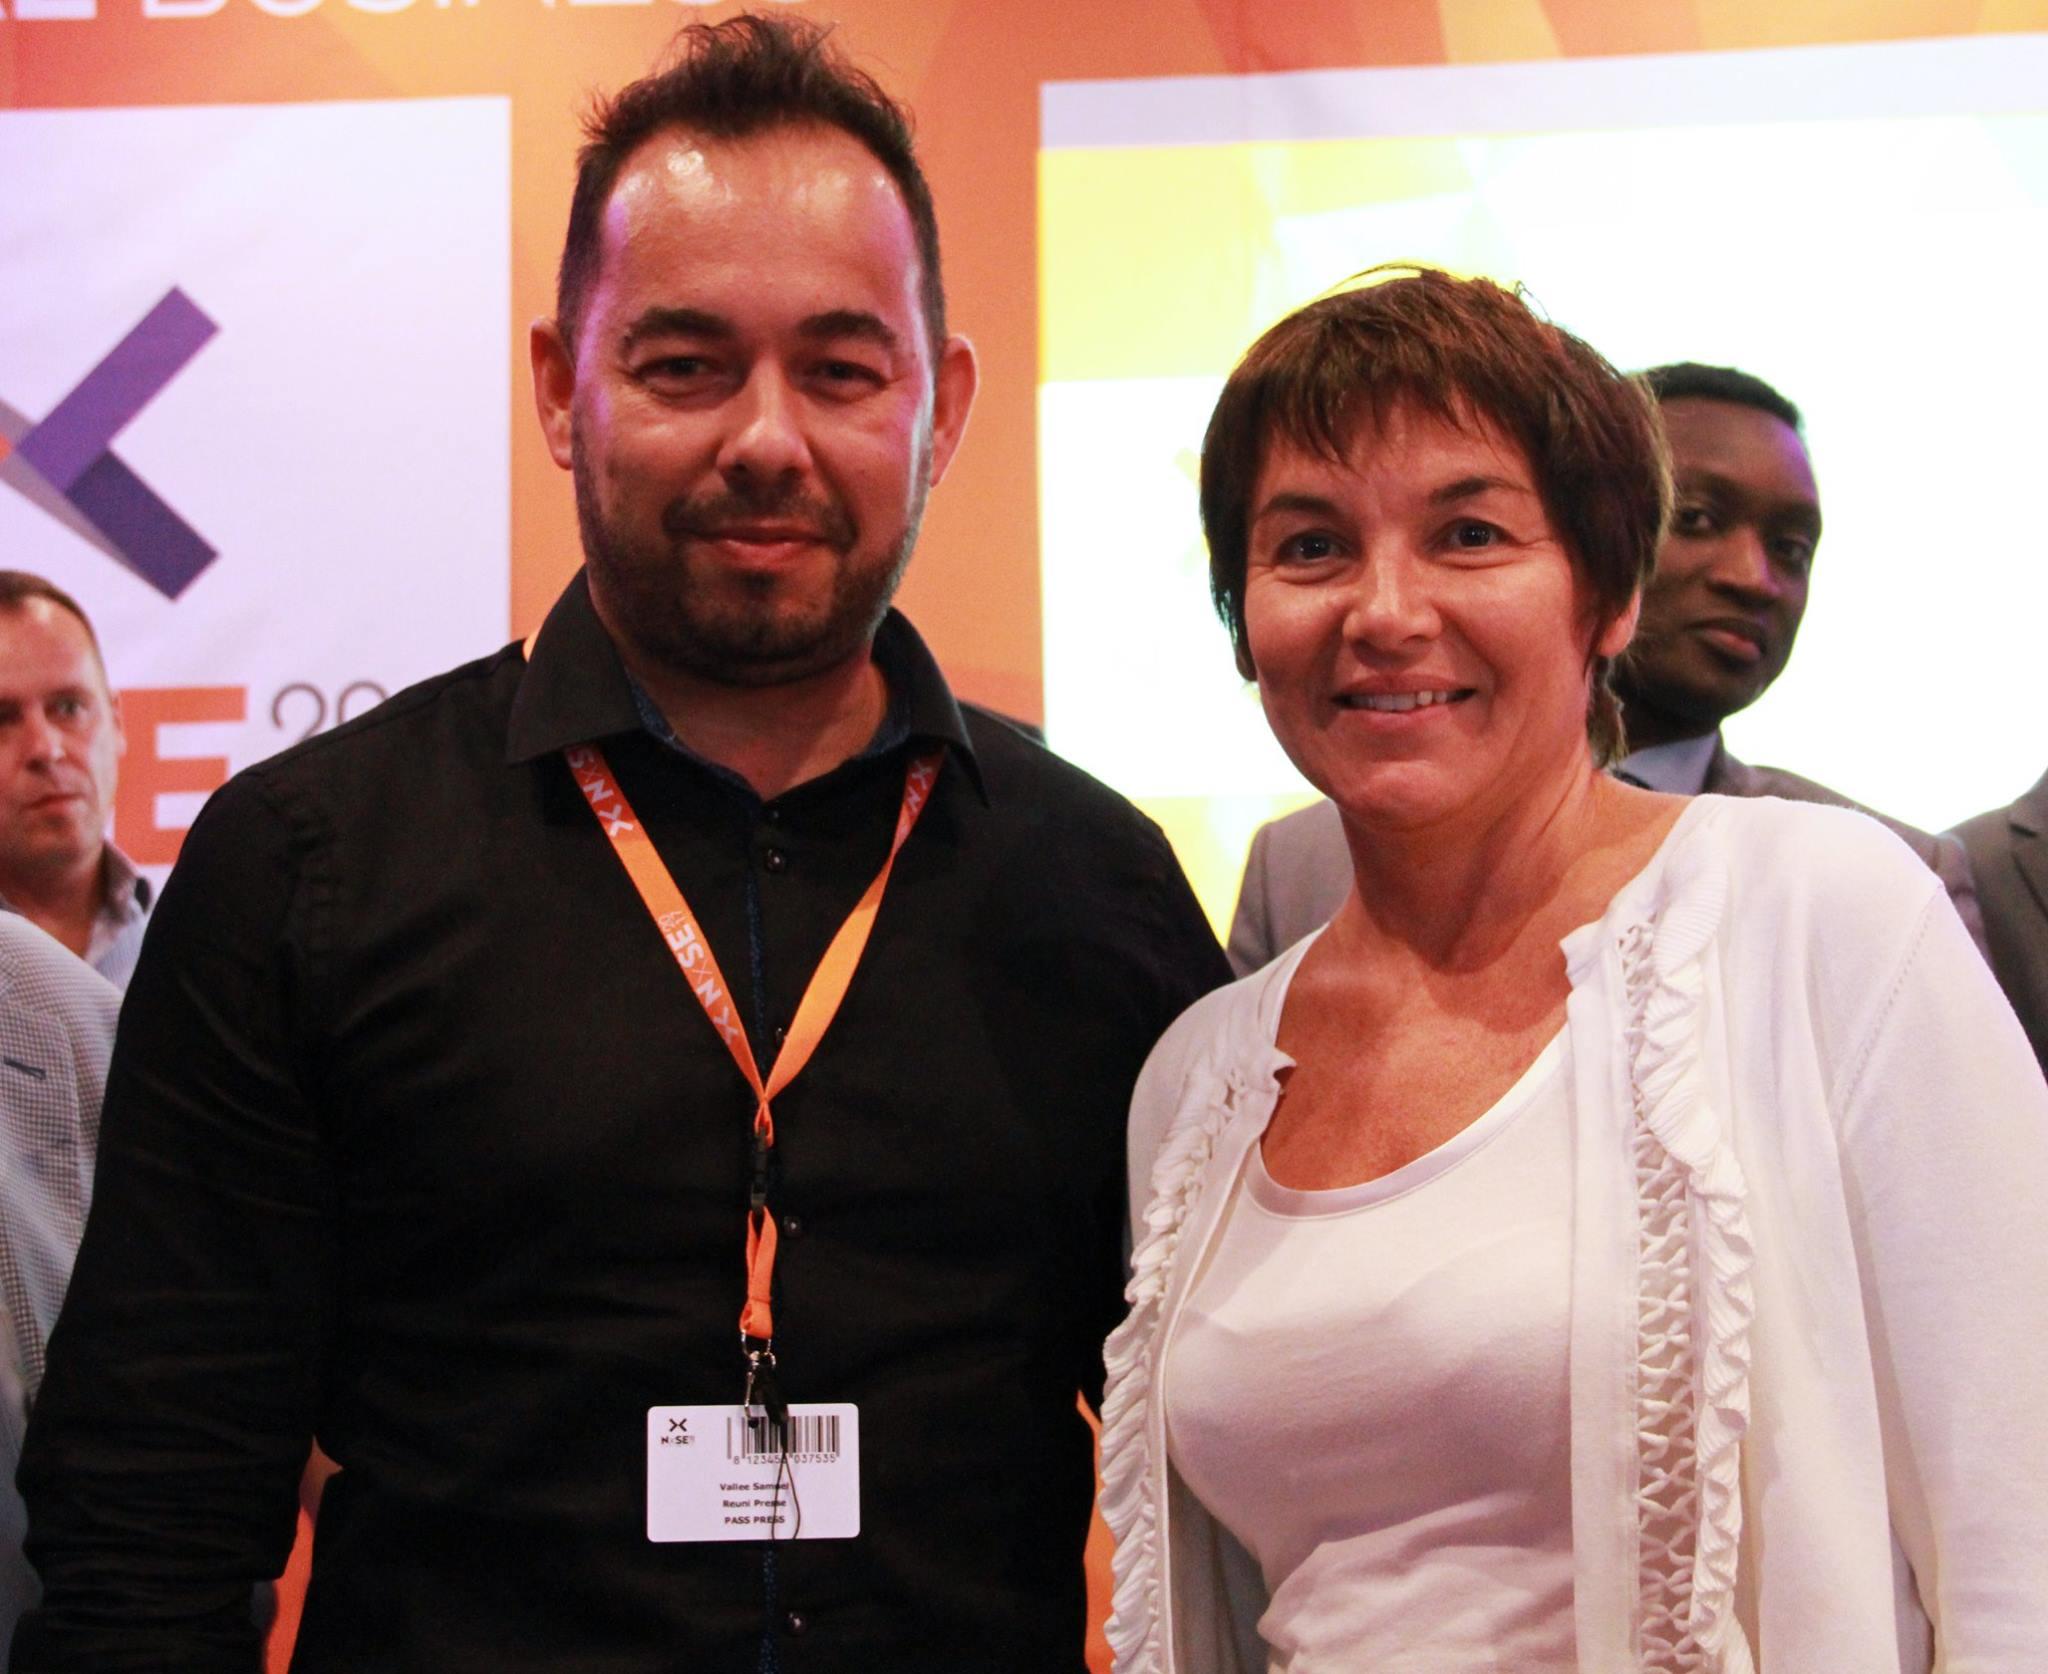 NxSE : Forum d'Affaires International